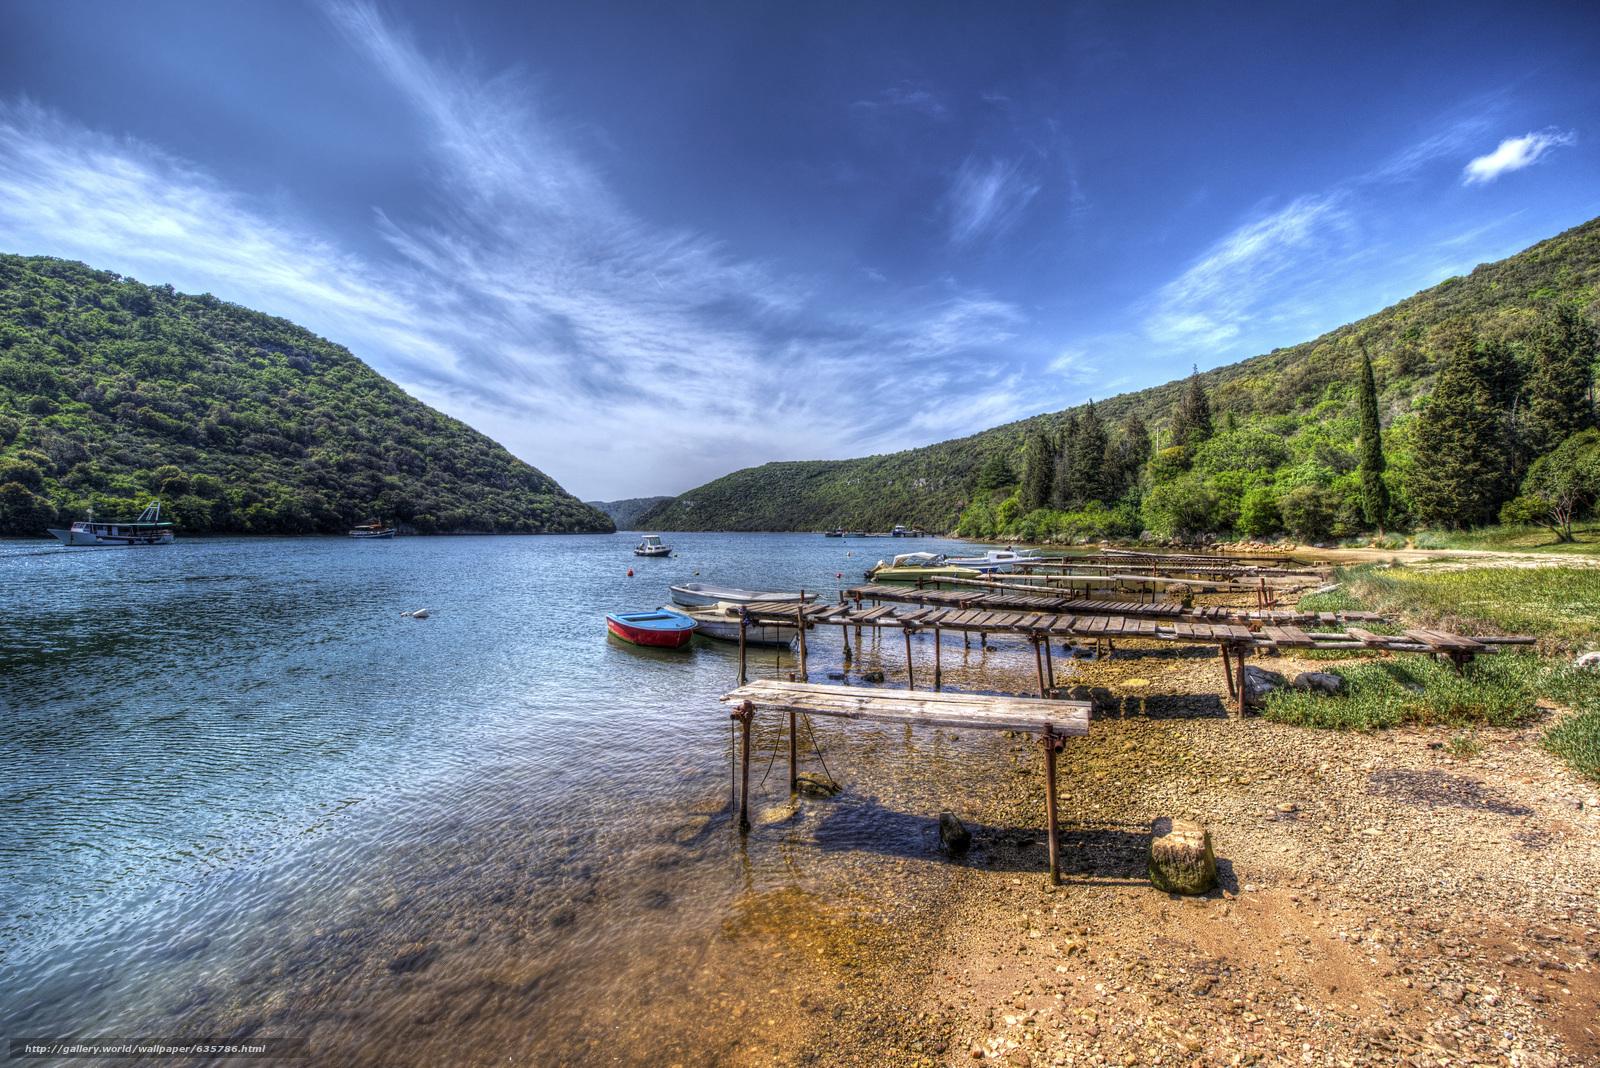 croatia landscape wallpaper - photo #10